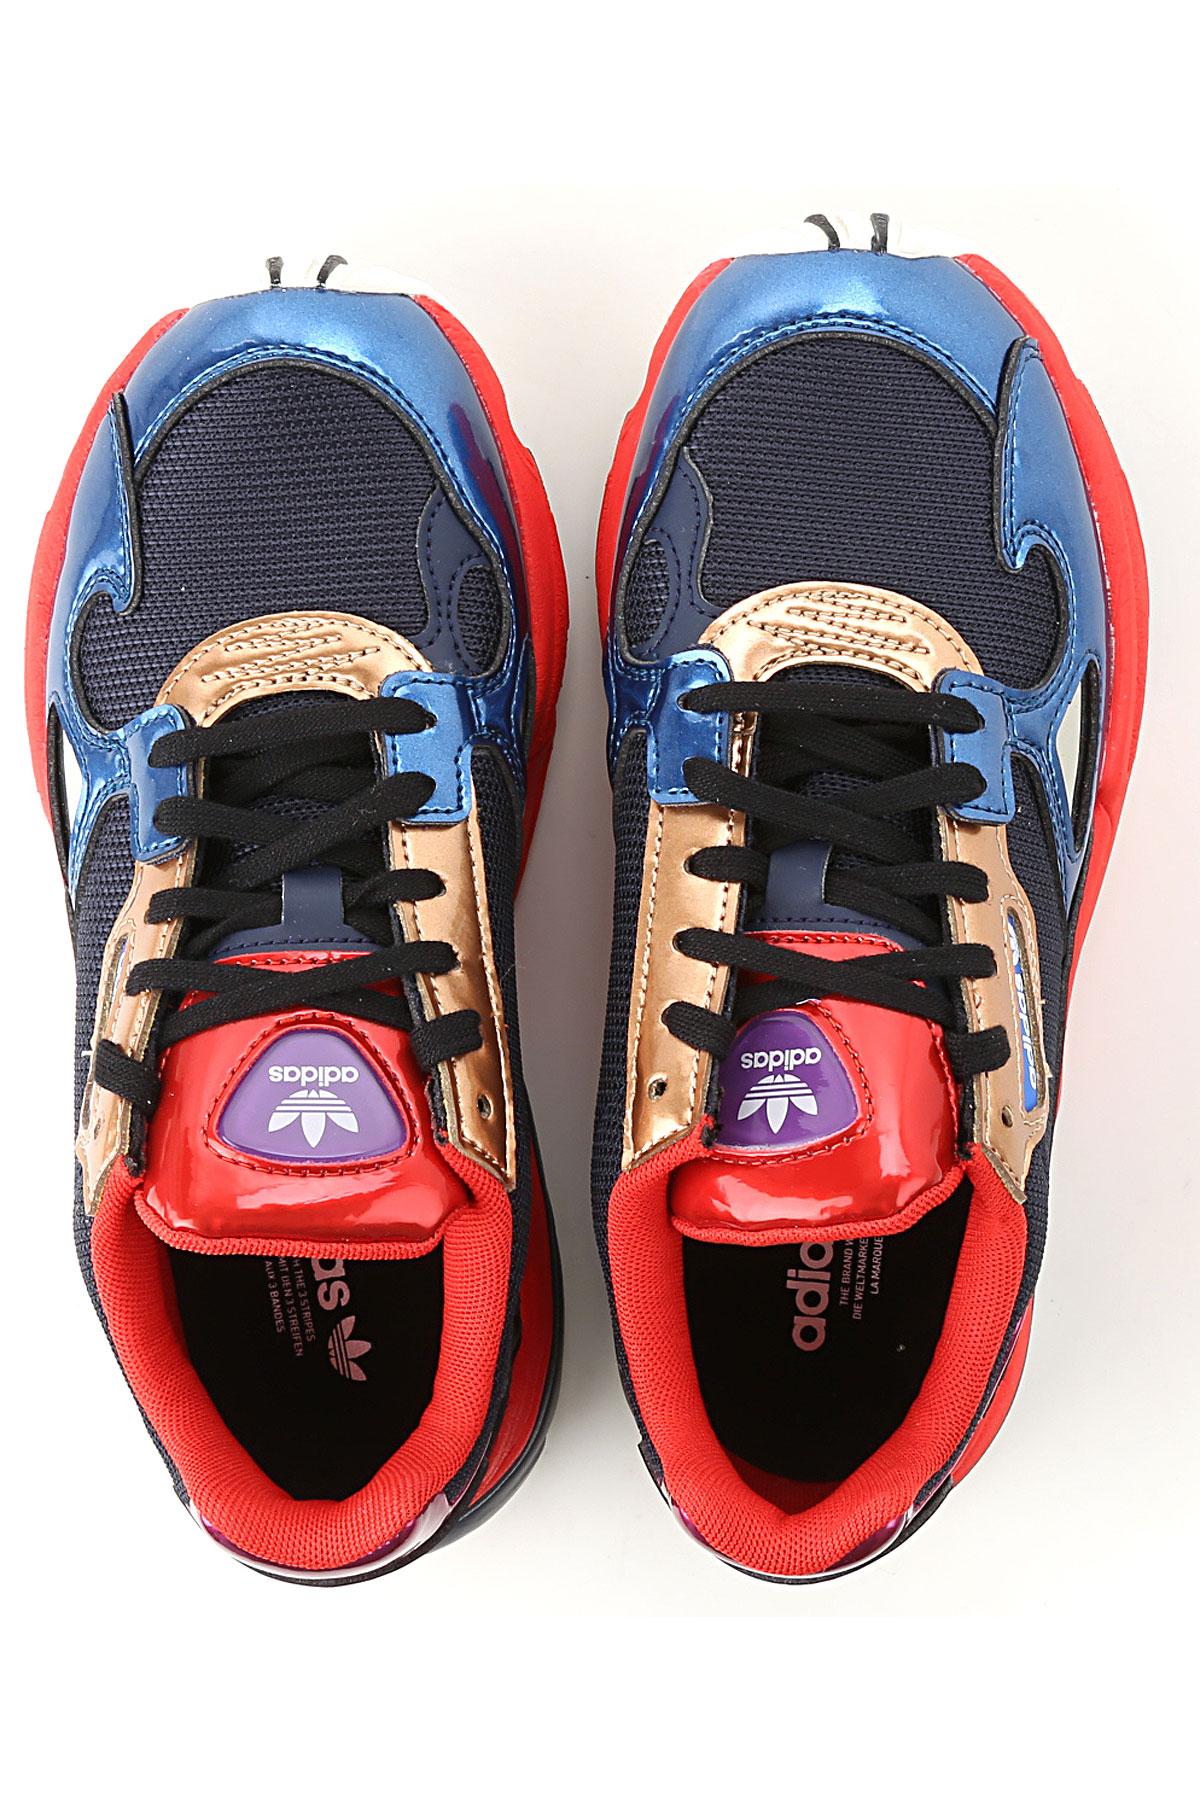 5342b4047 2019 Marina Rojo Adidas Para Zapatos Primavera verano Mujer qZzYawX